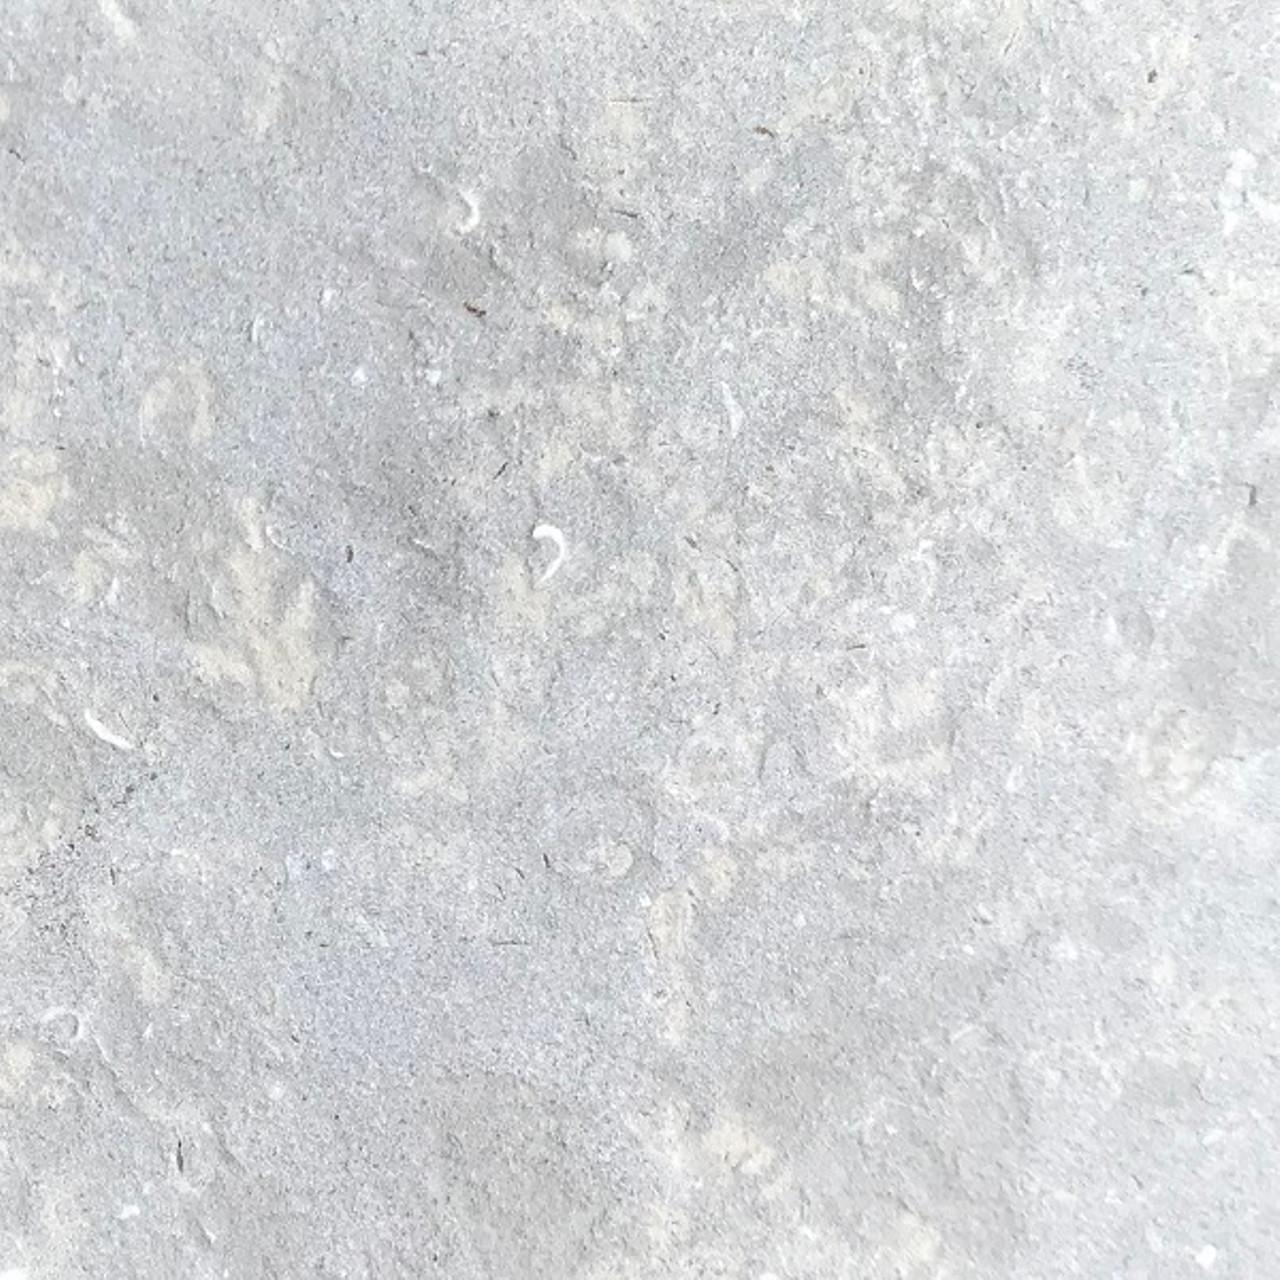 Plaza gray limestone sandblasted finish